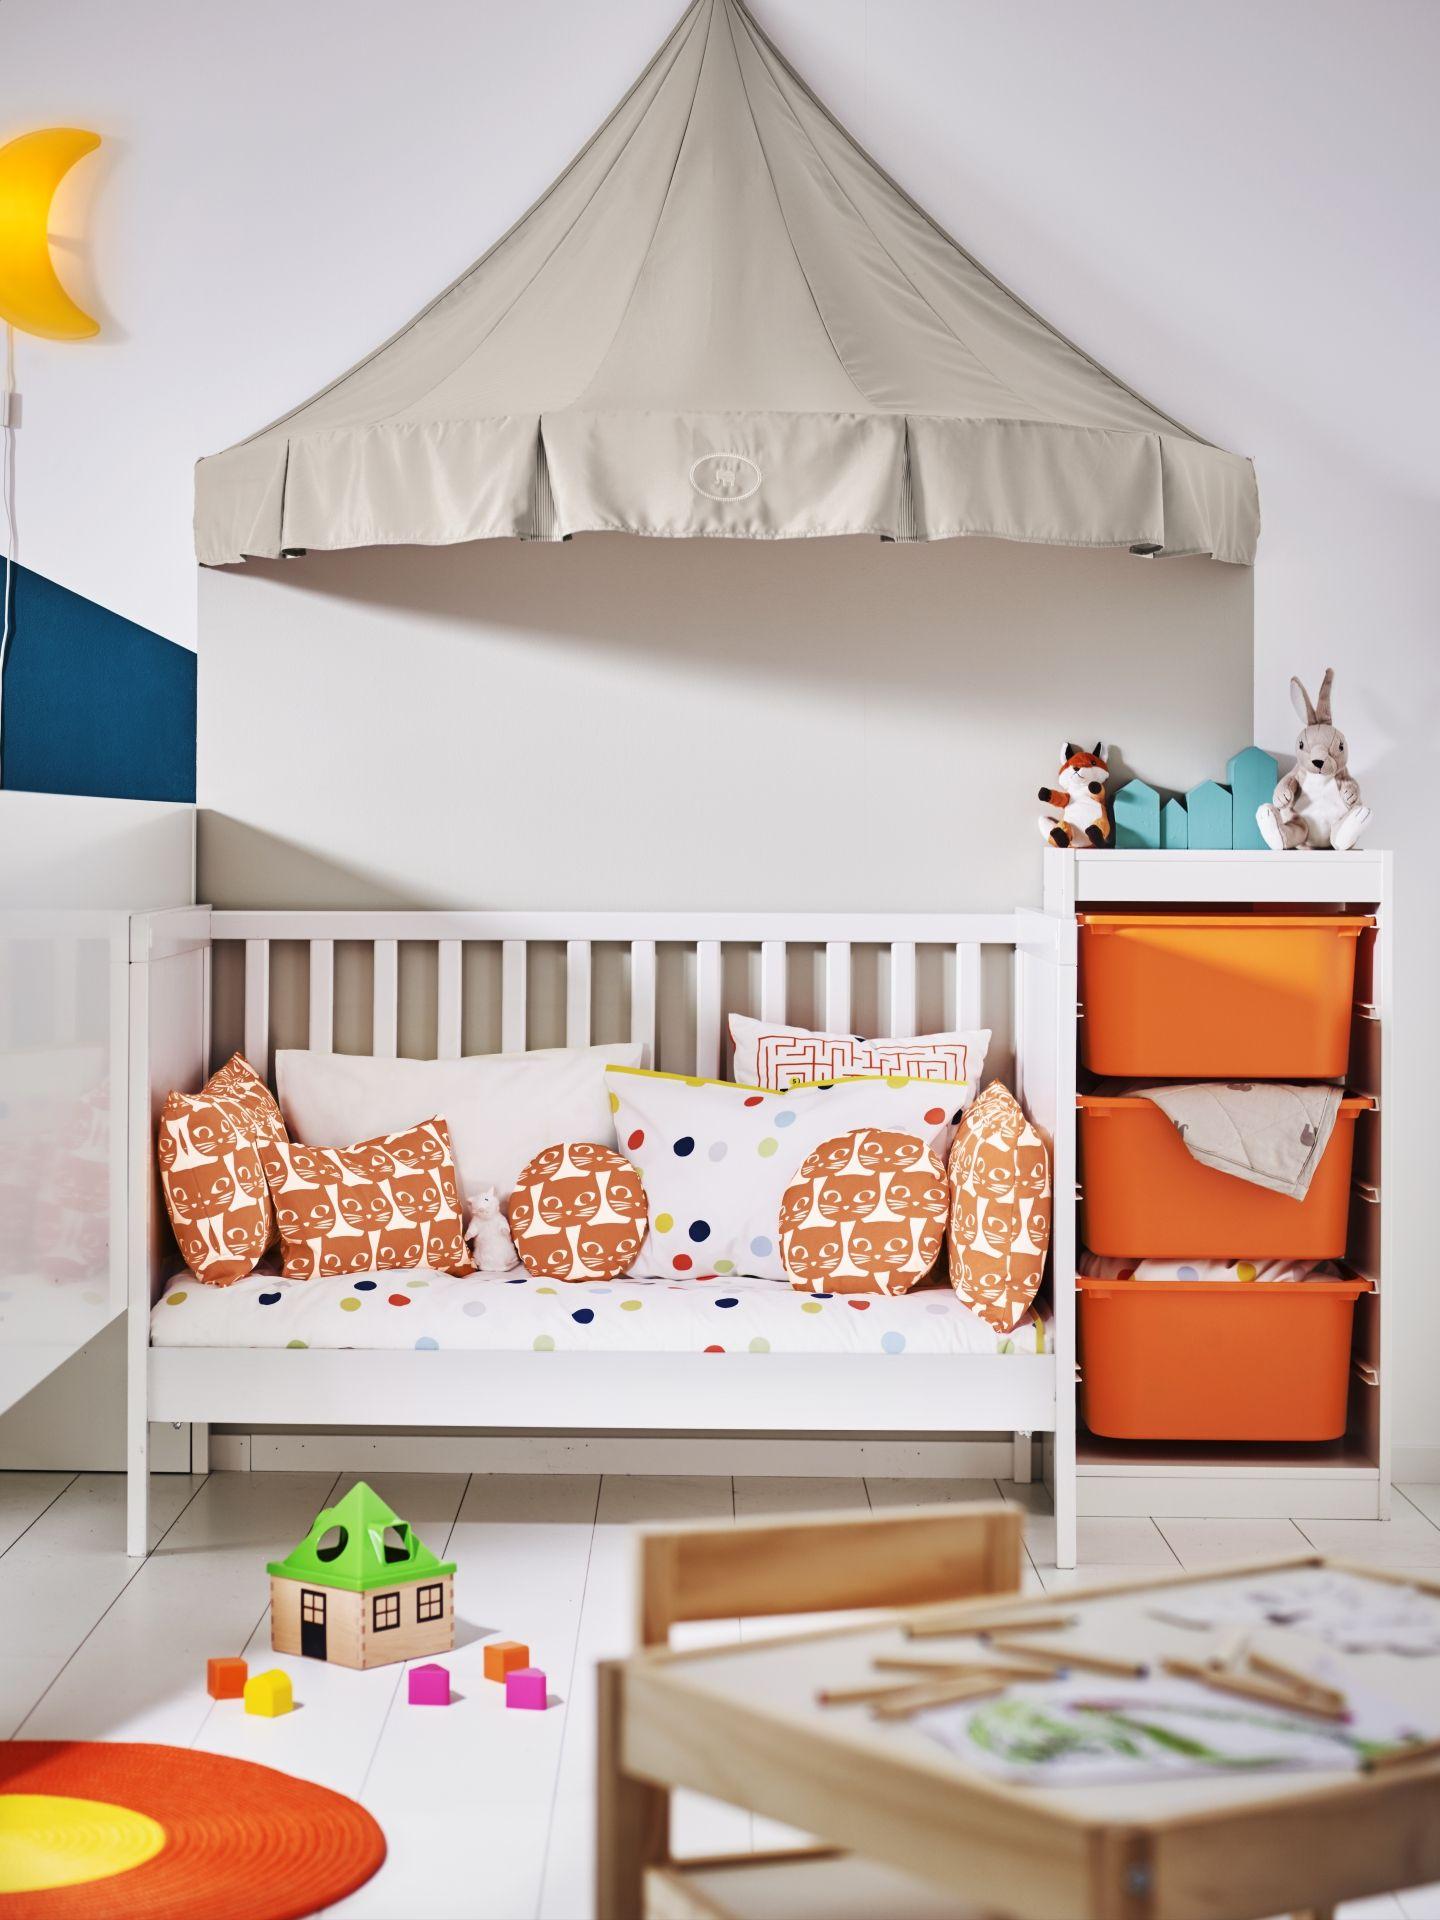 CHARMTROLL bedhemel   #IKEAcatalogus #nieuw #2017 #IKEA #IKEAnl #bed ...